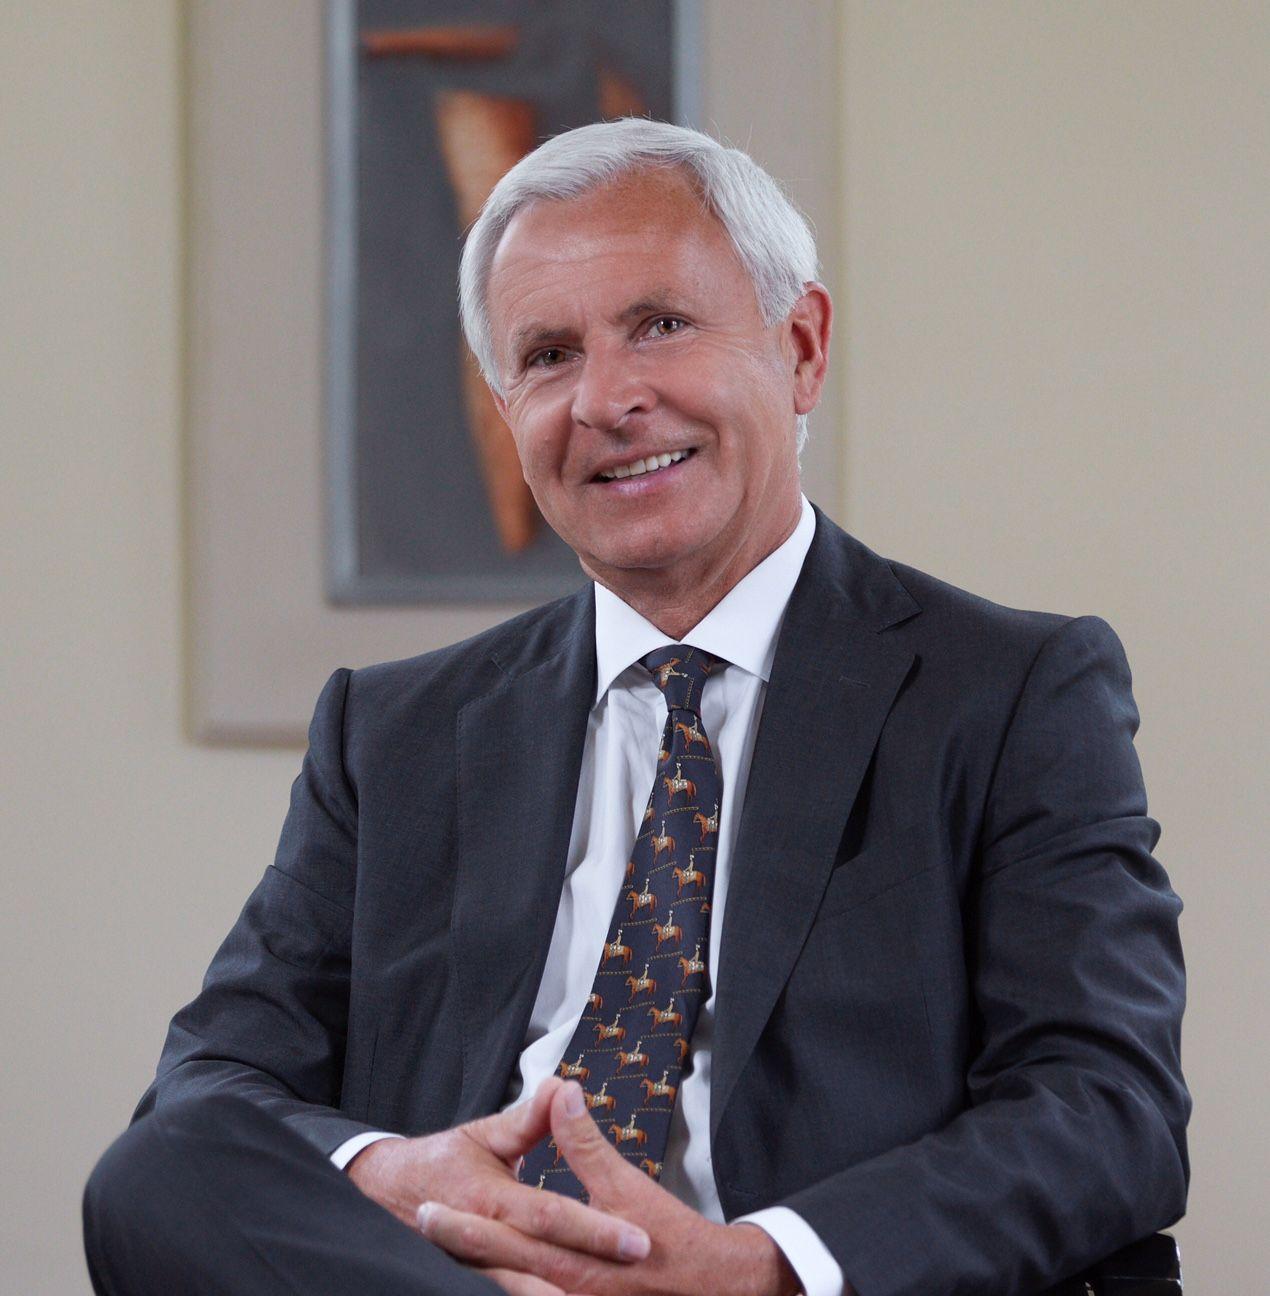 Prof. Dr. Mark Binz